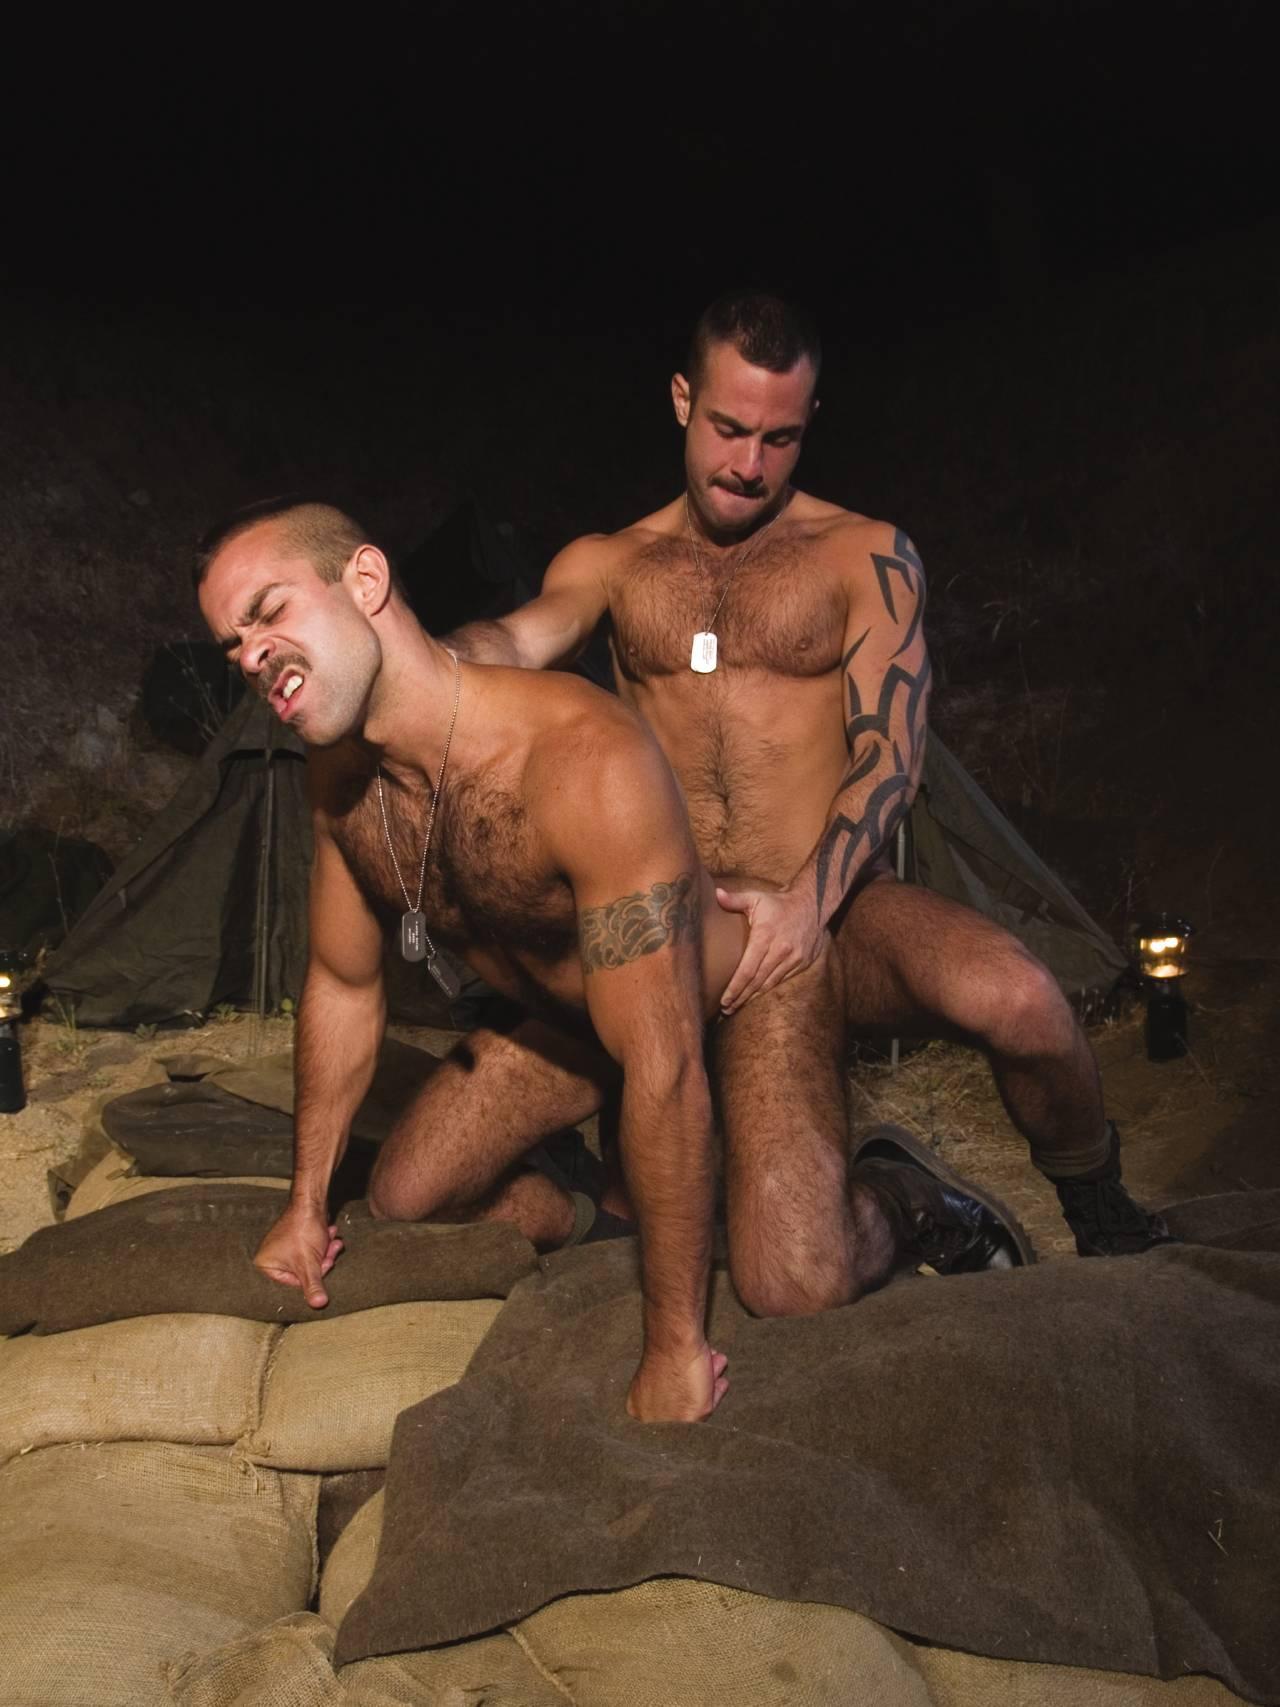 Orlando Toro fuck Steve Cruz gay hot daddy dude men porn Grunts